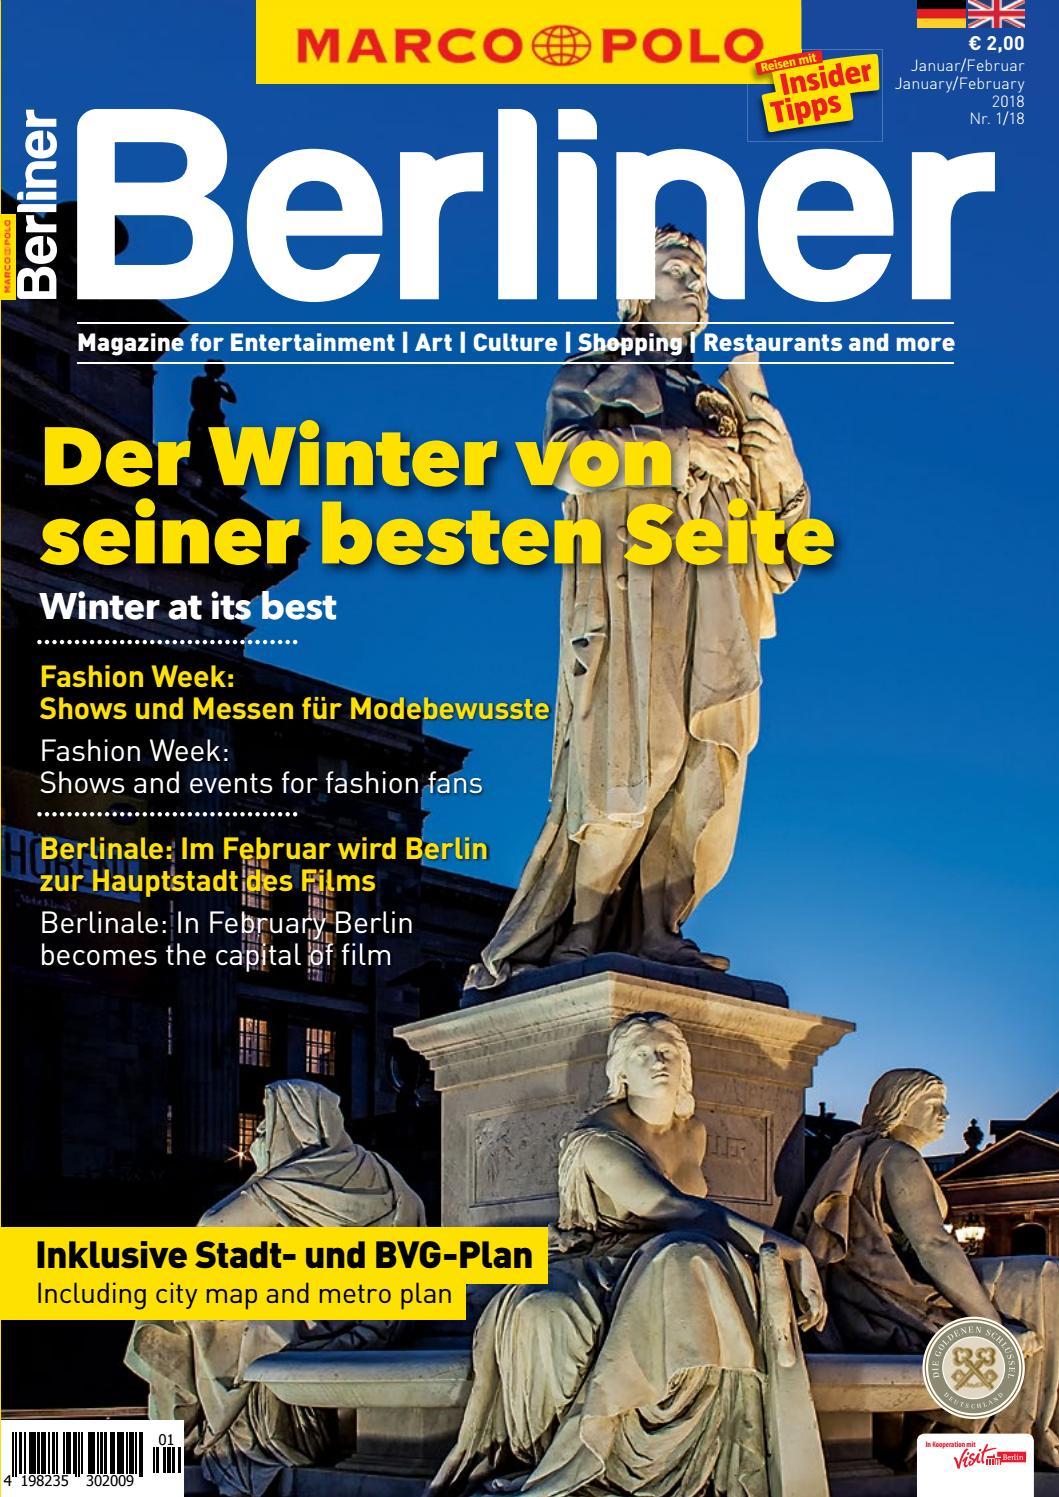 Marco Polo Berliner #01/18 by Berlin Medien GmbH - issuu